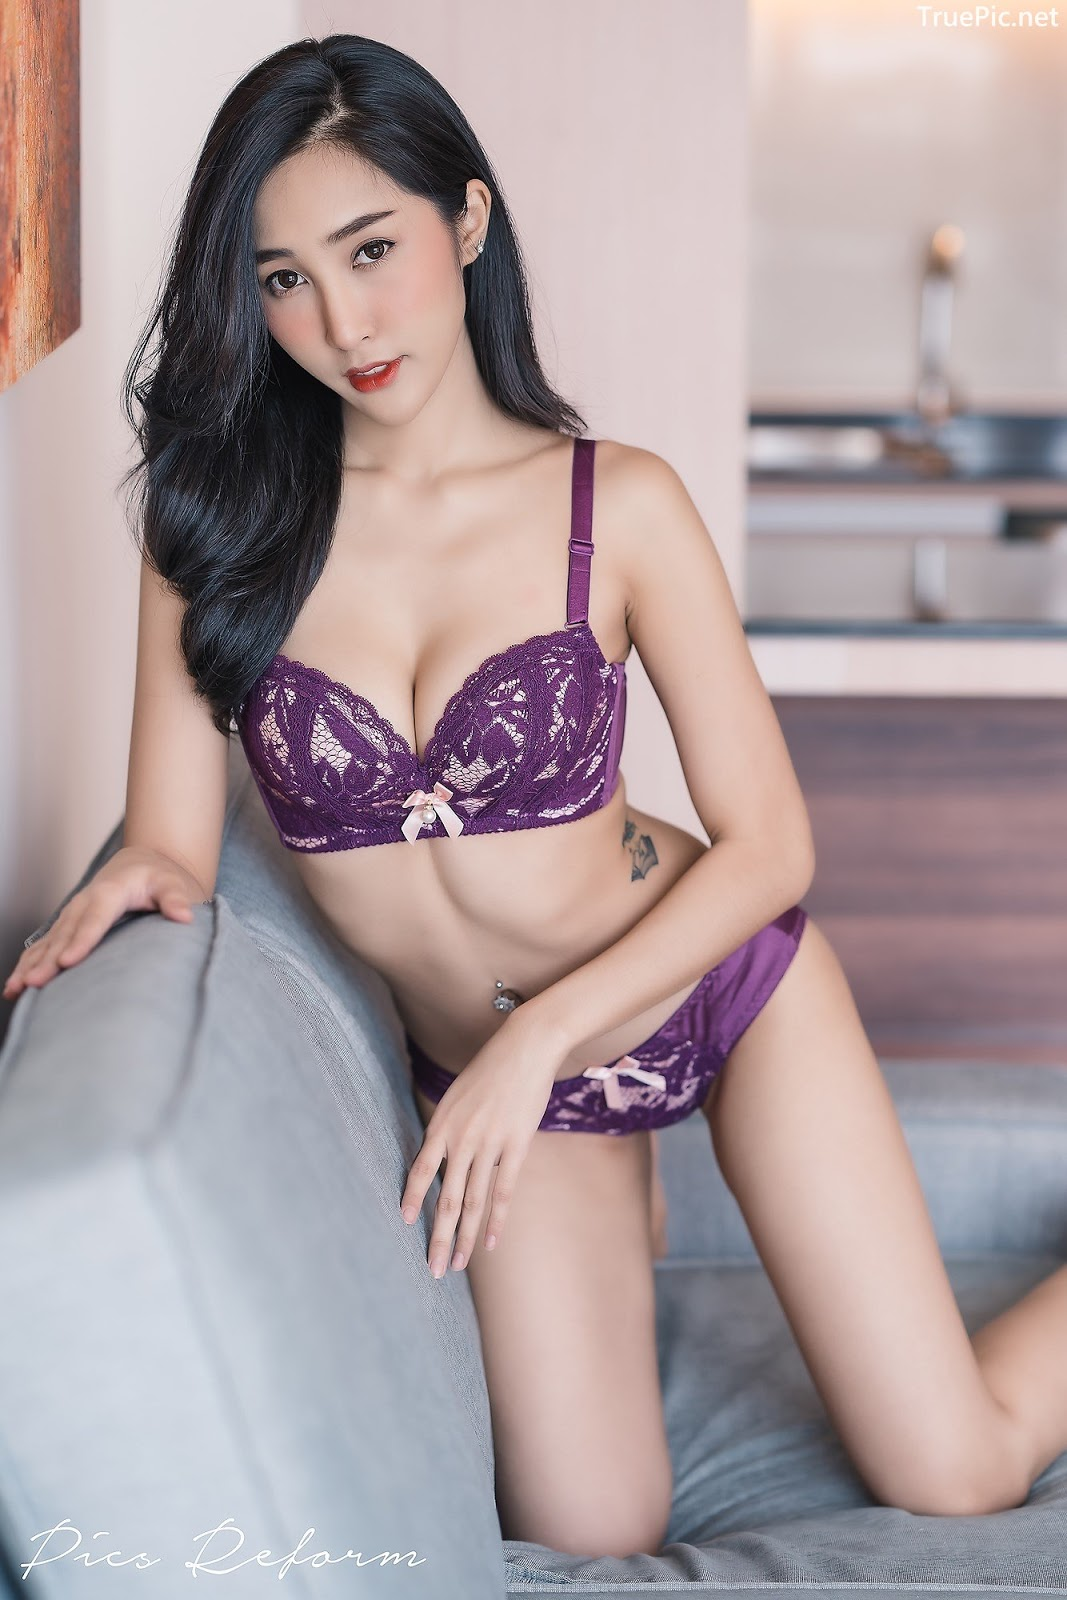 Image-Thailand-Sexy-Model-Yanapat-Ukkararujipat-Violet-Girl-TruePic.net- Picture-5